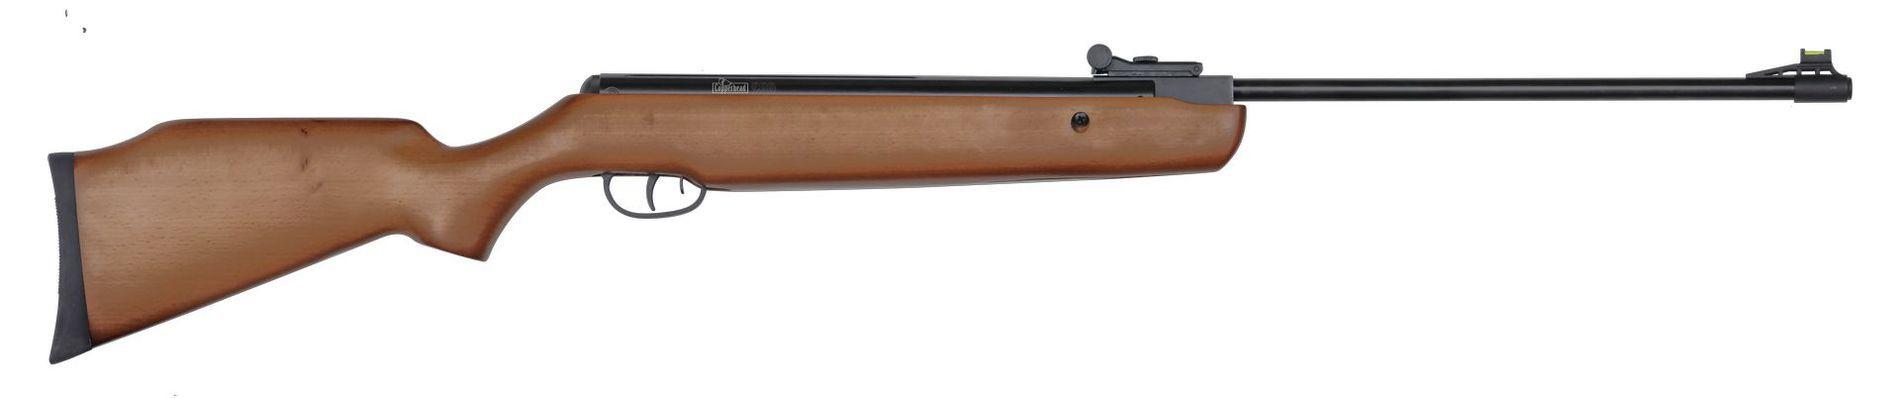 Carabine à plombs Crosman Copperhead 900 Bois Cal. 4,5mm 19,9J